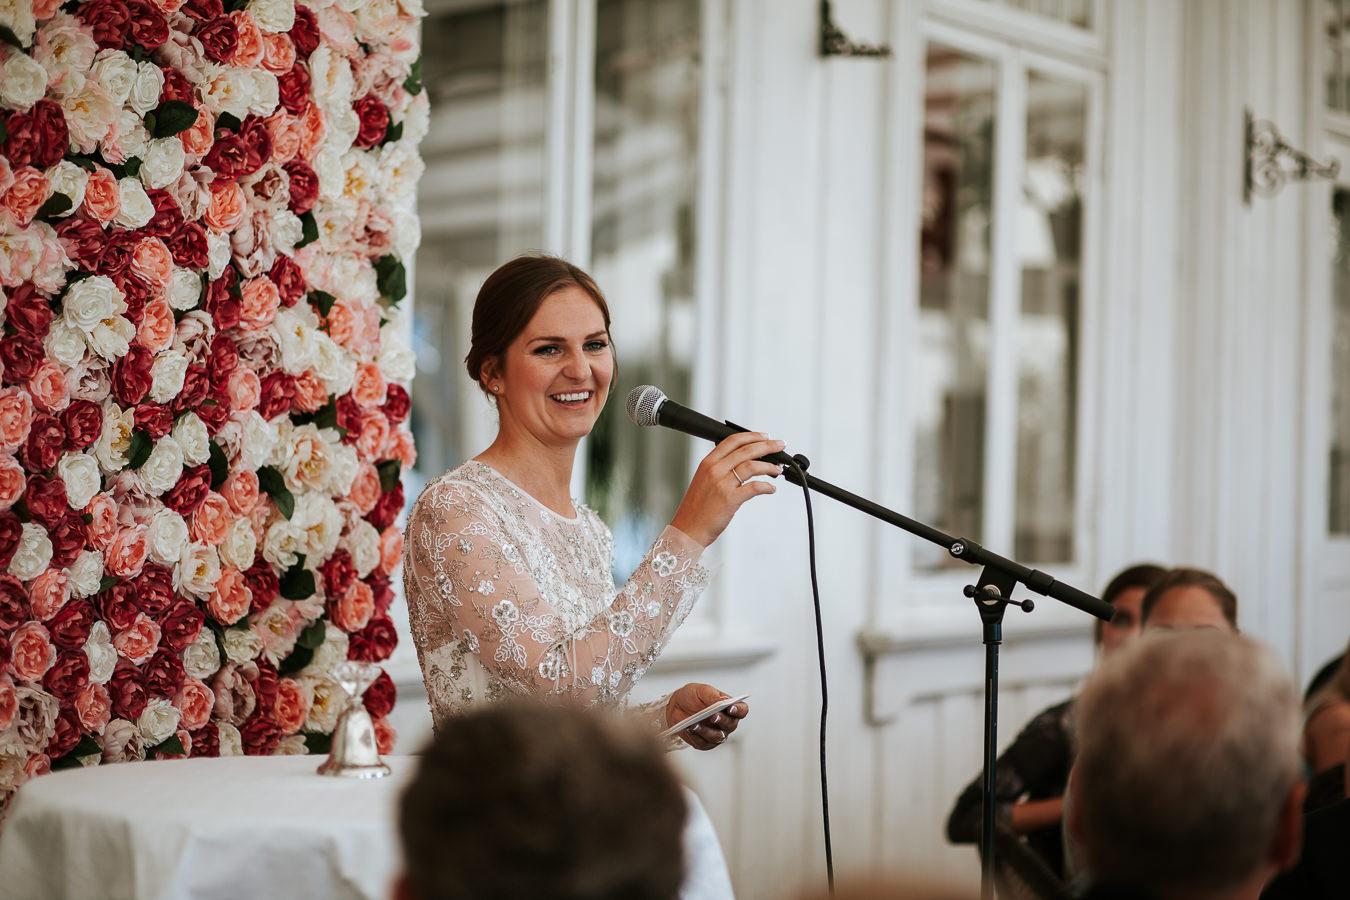 Bryllup-Hellviktangen-fotograf-tvedt-148.jpg